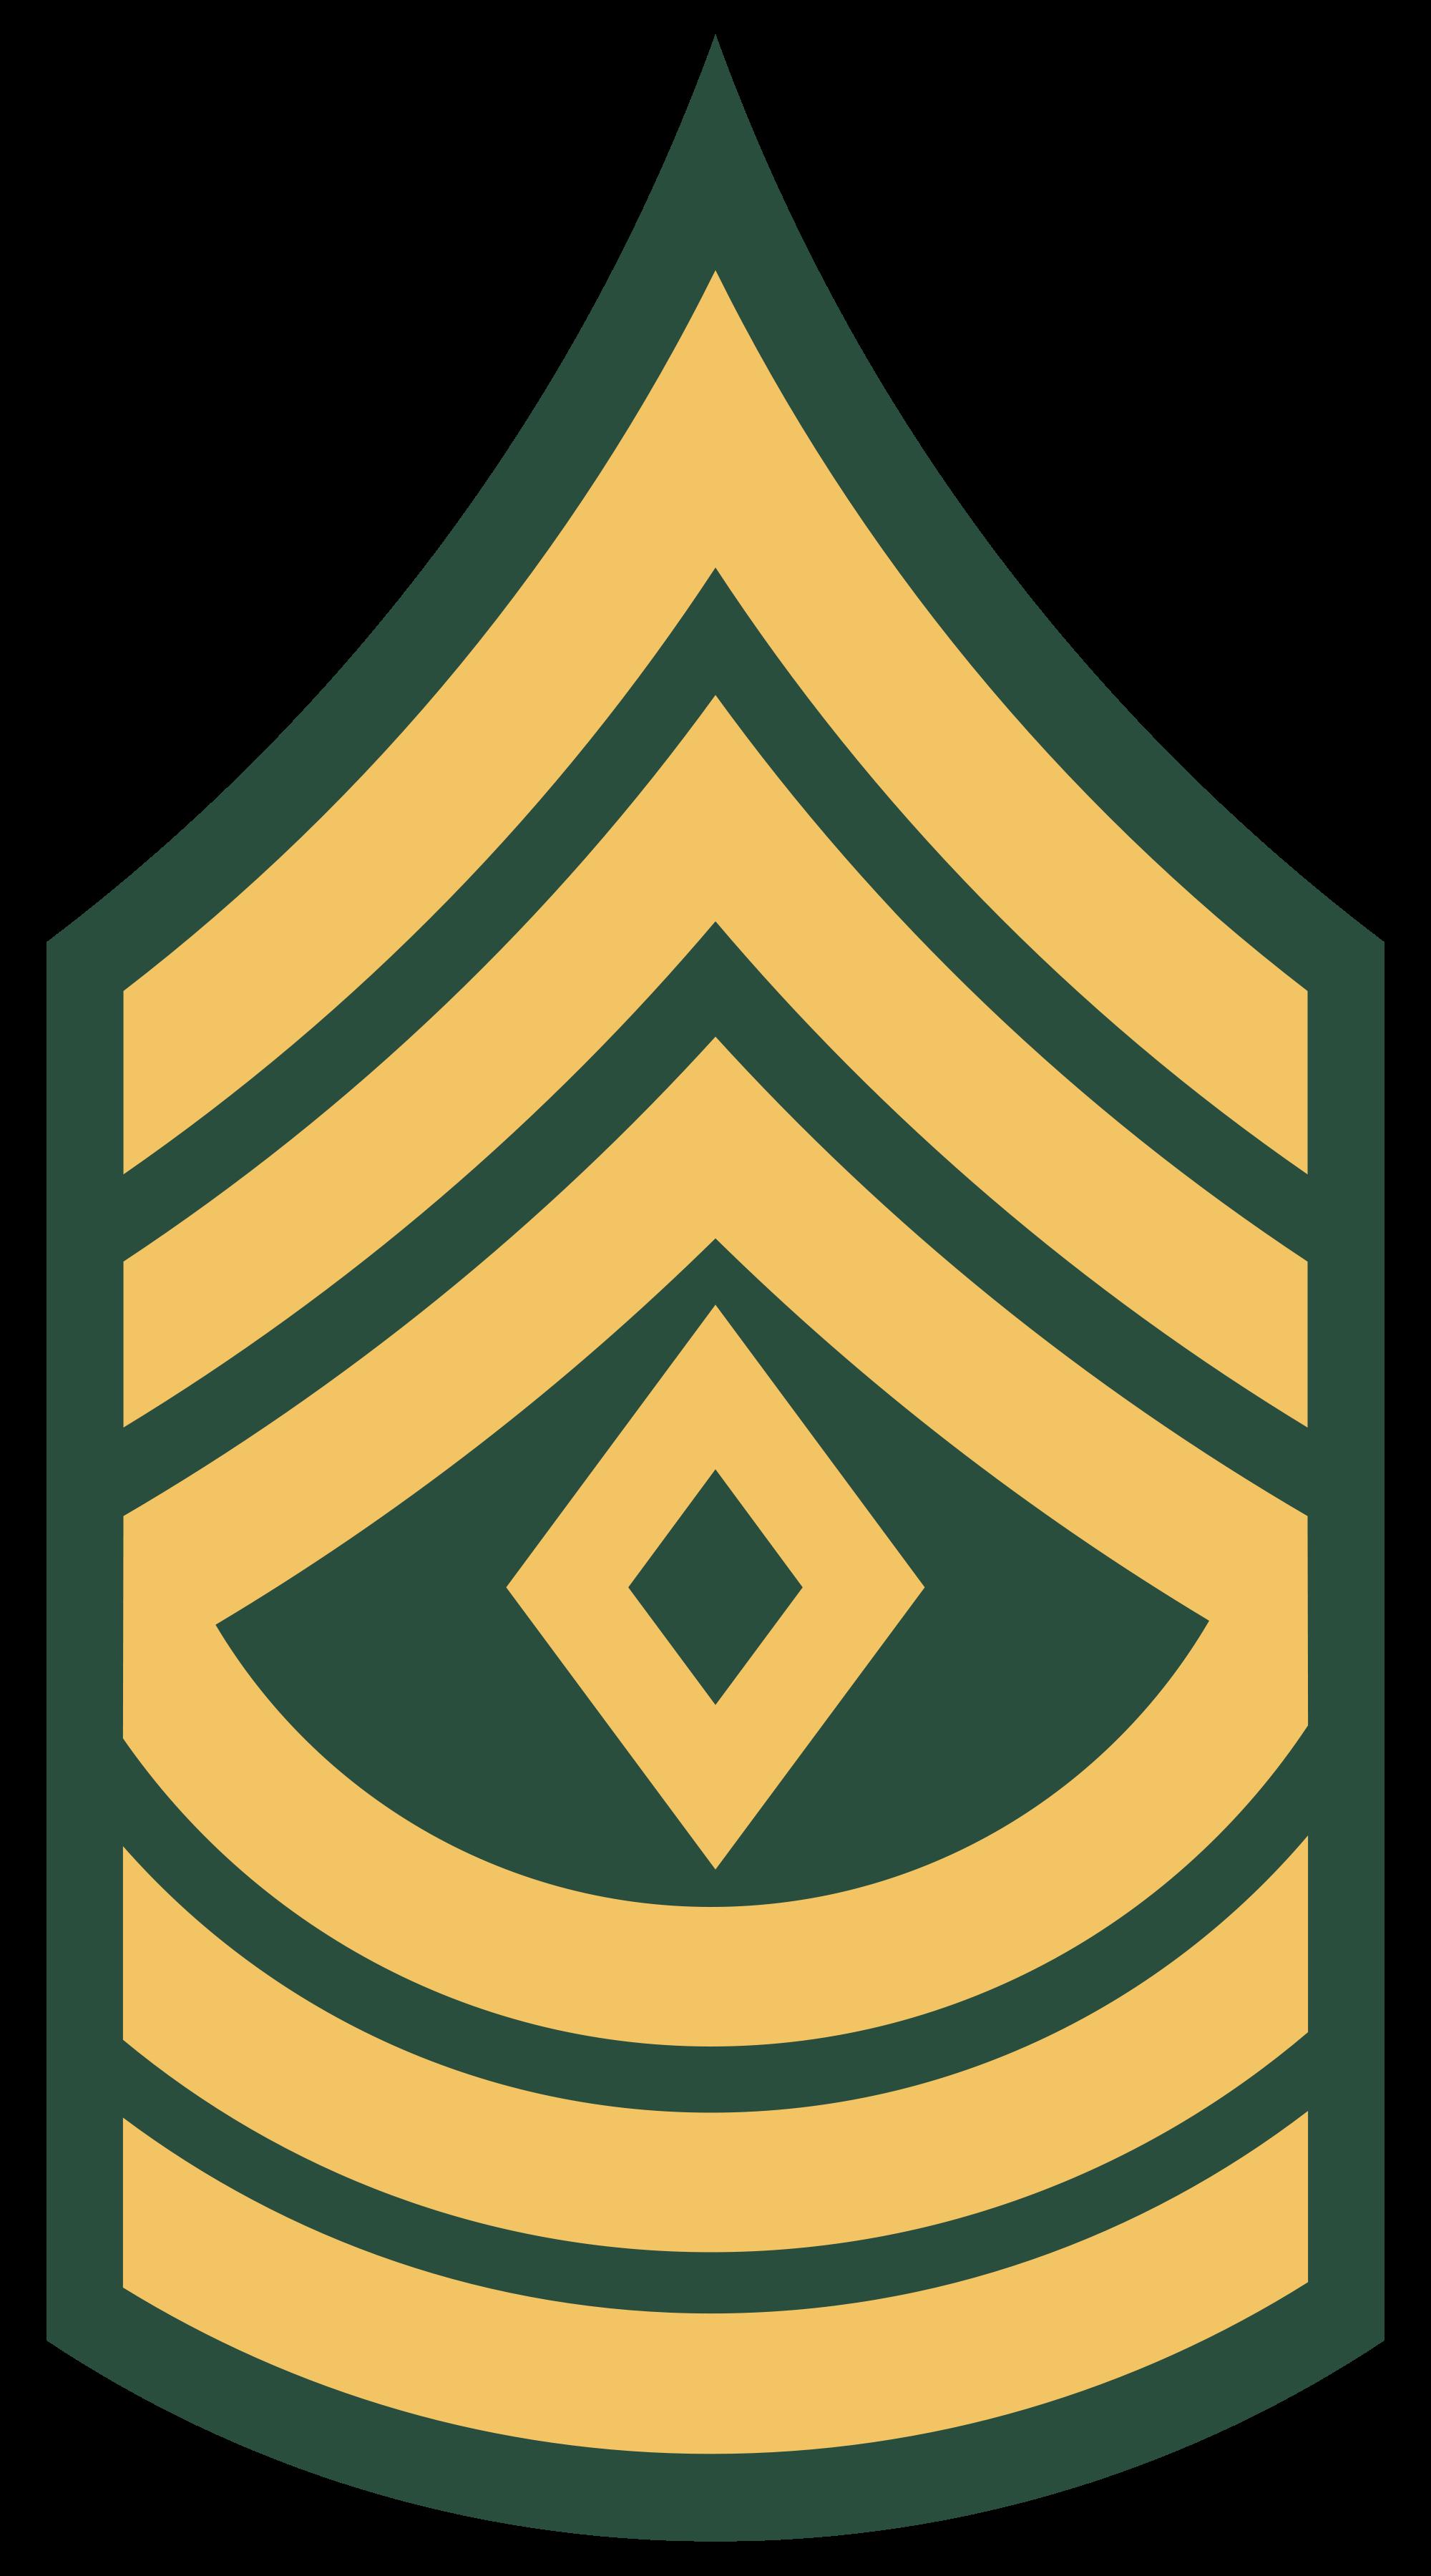 military insignia clipart - photo #7